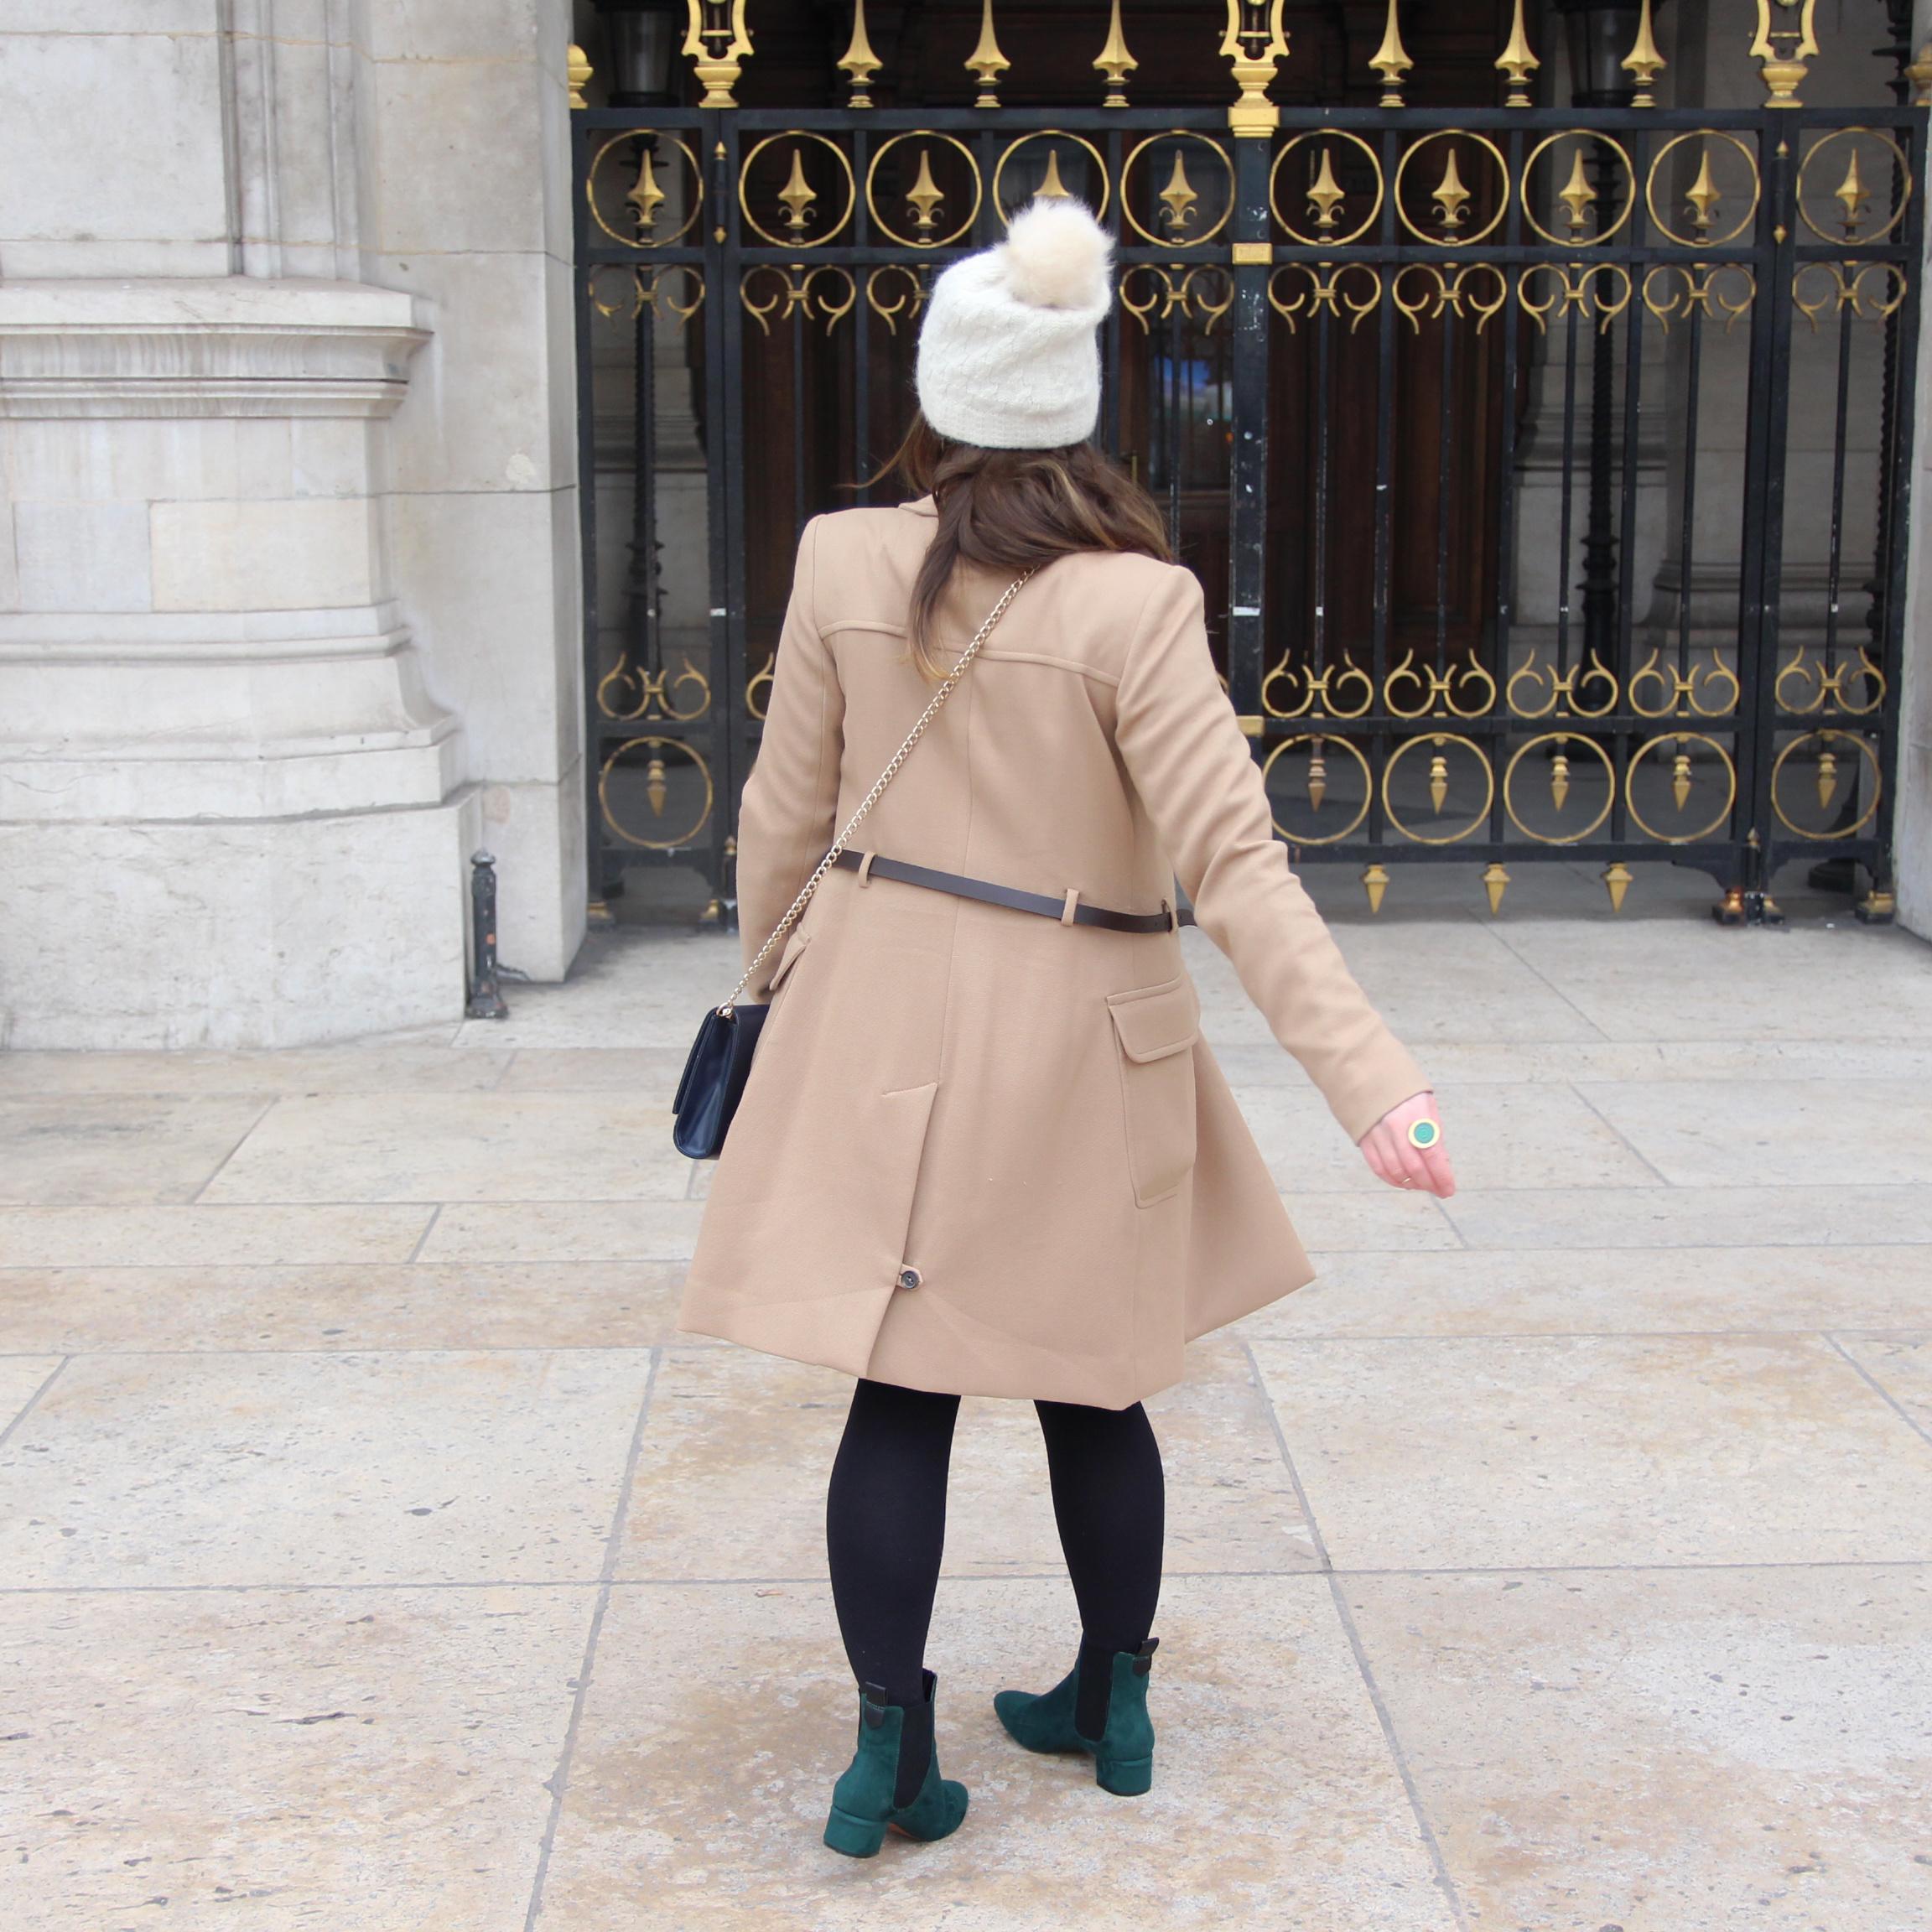 paris-opera-garnier-winter-day-influencer-style-personalstylist-imageconsultant-seralynepointcom-img_6695